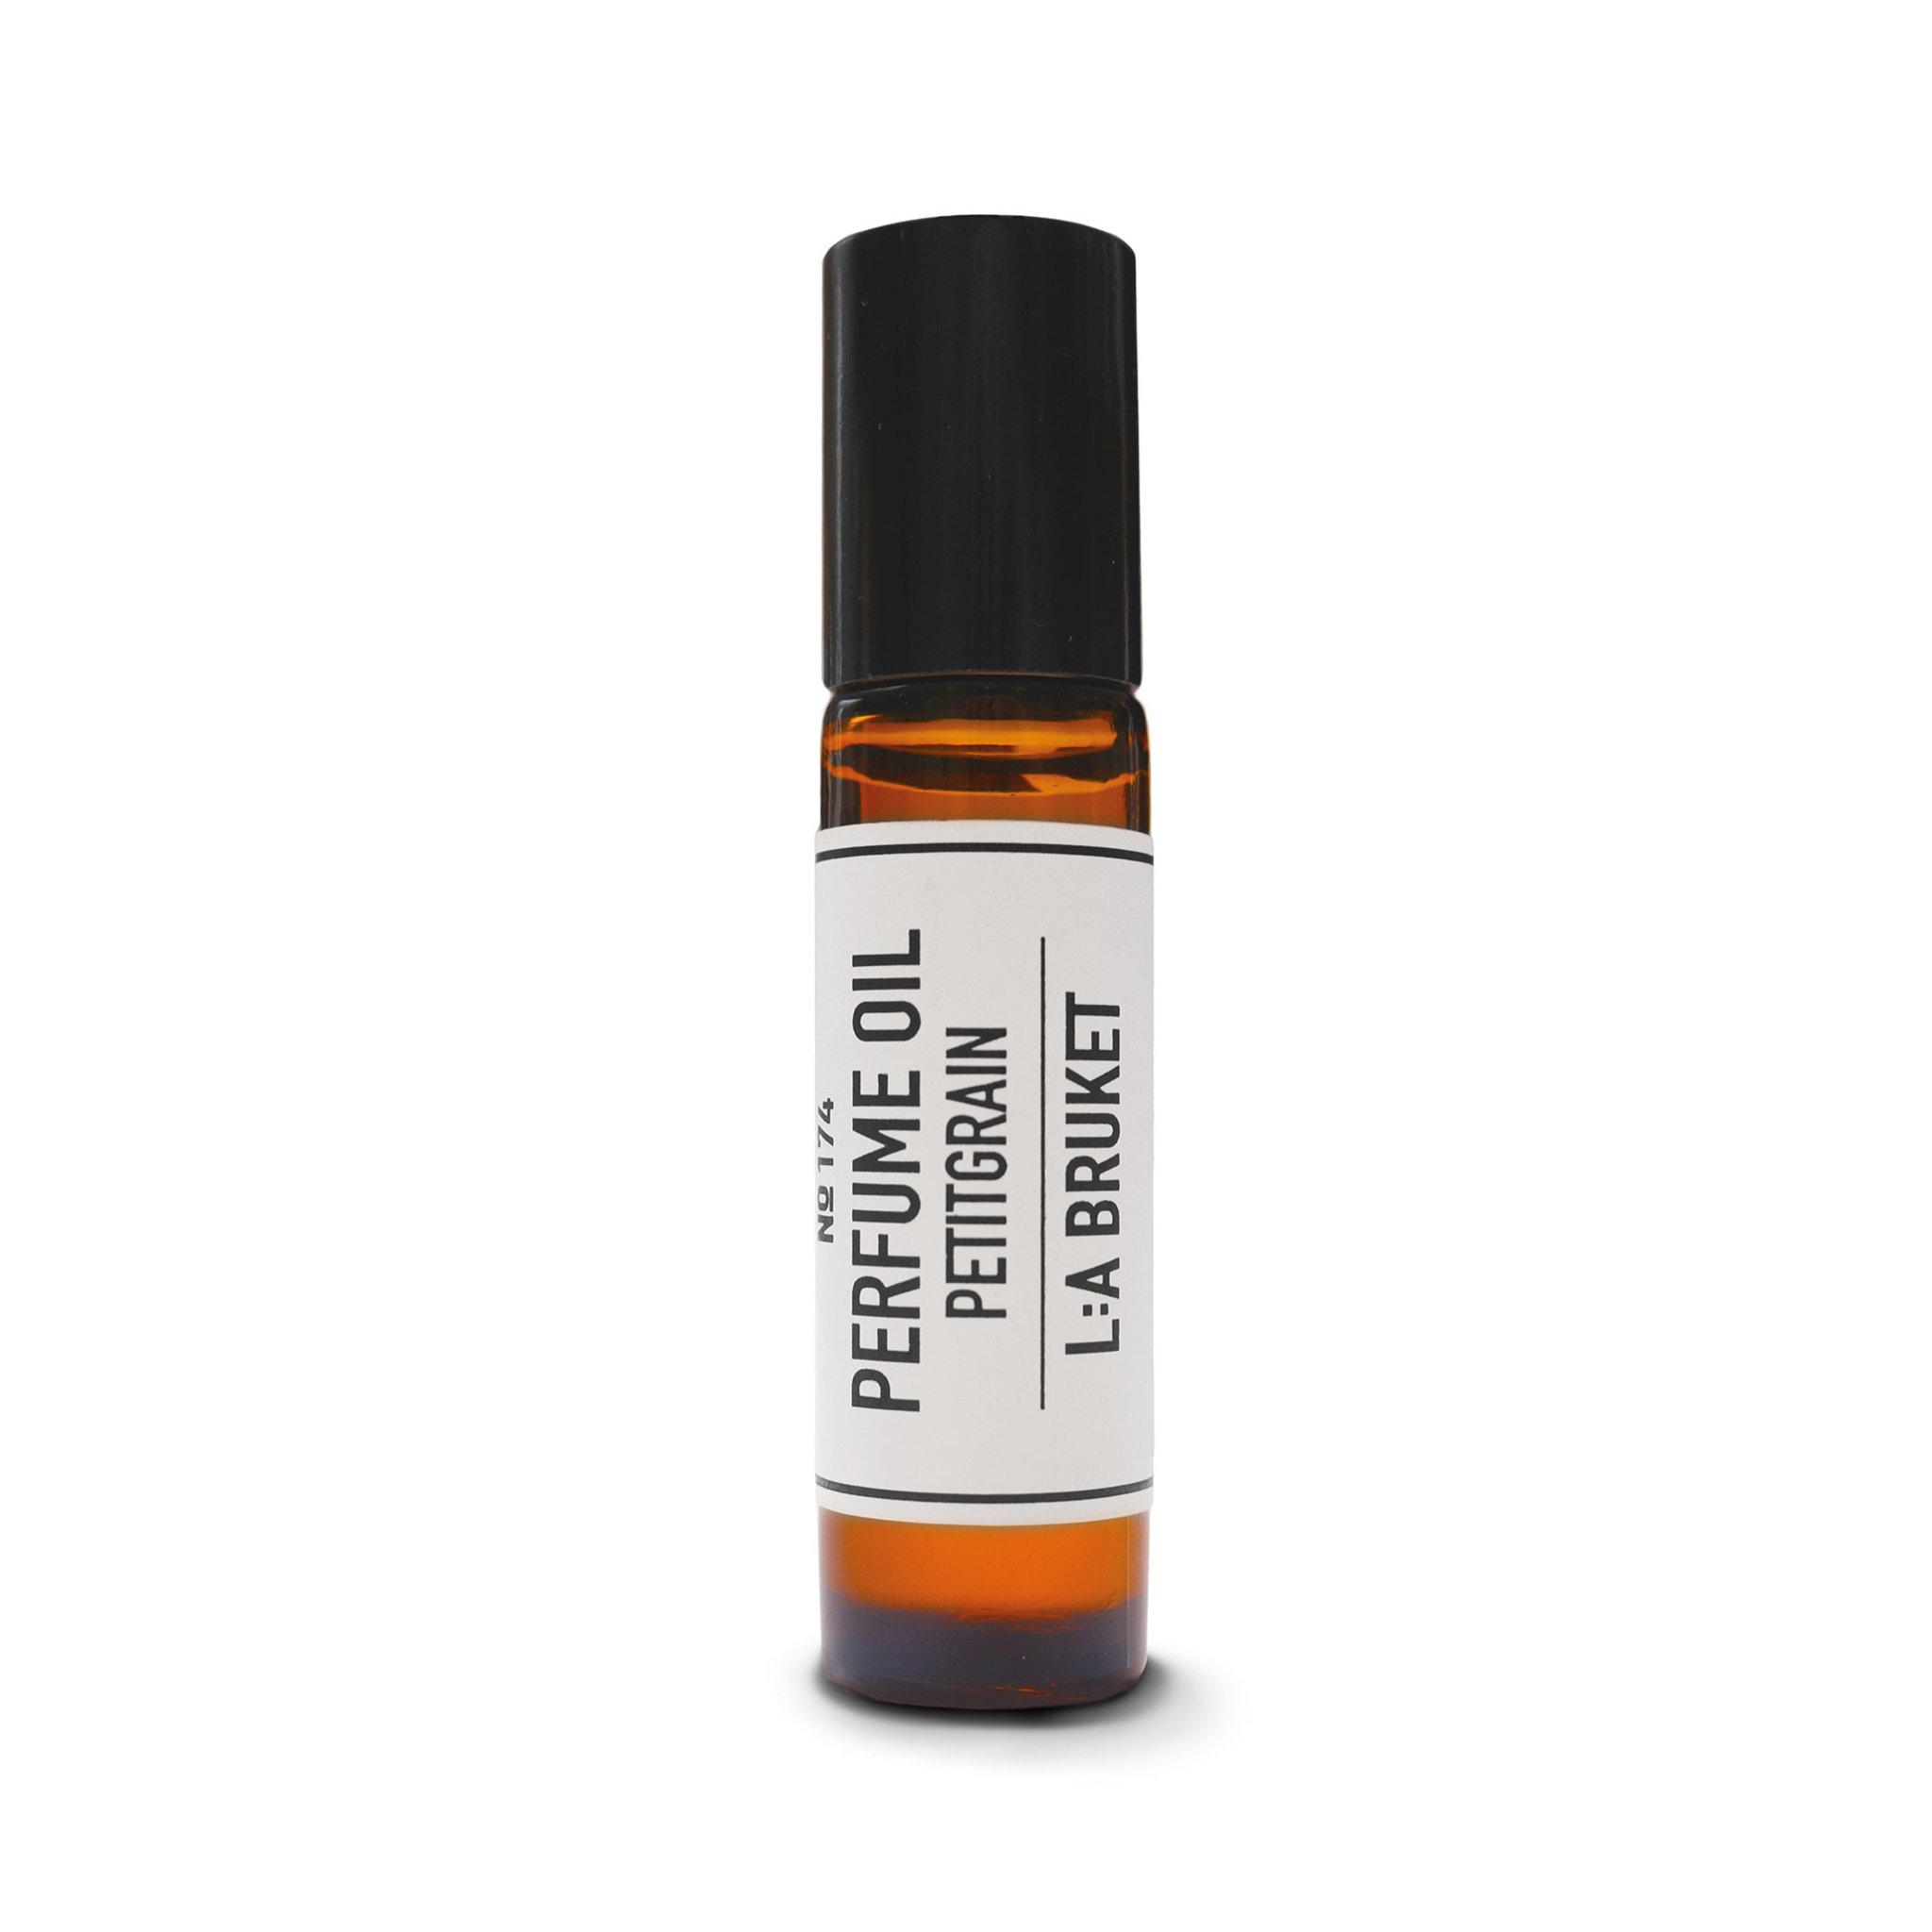 Perfume Oil Petitgrain 10 ml